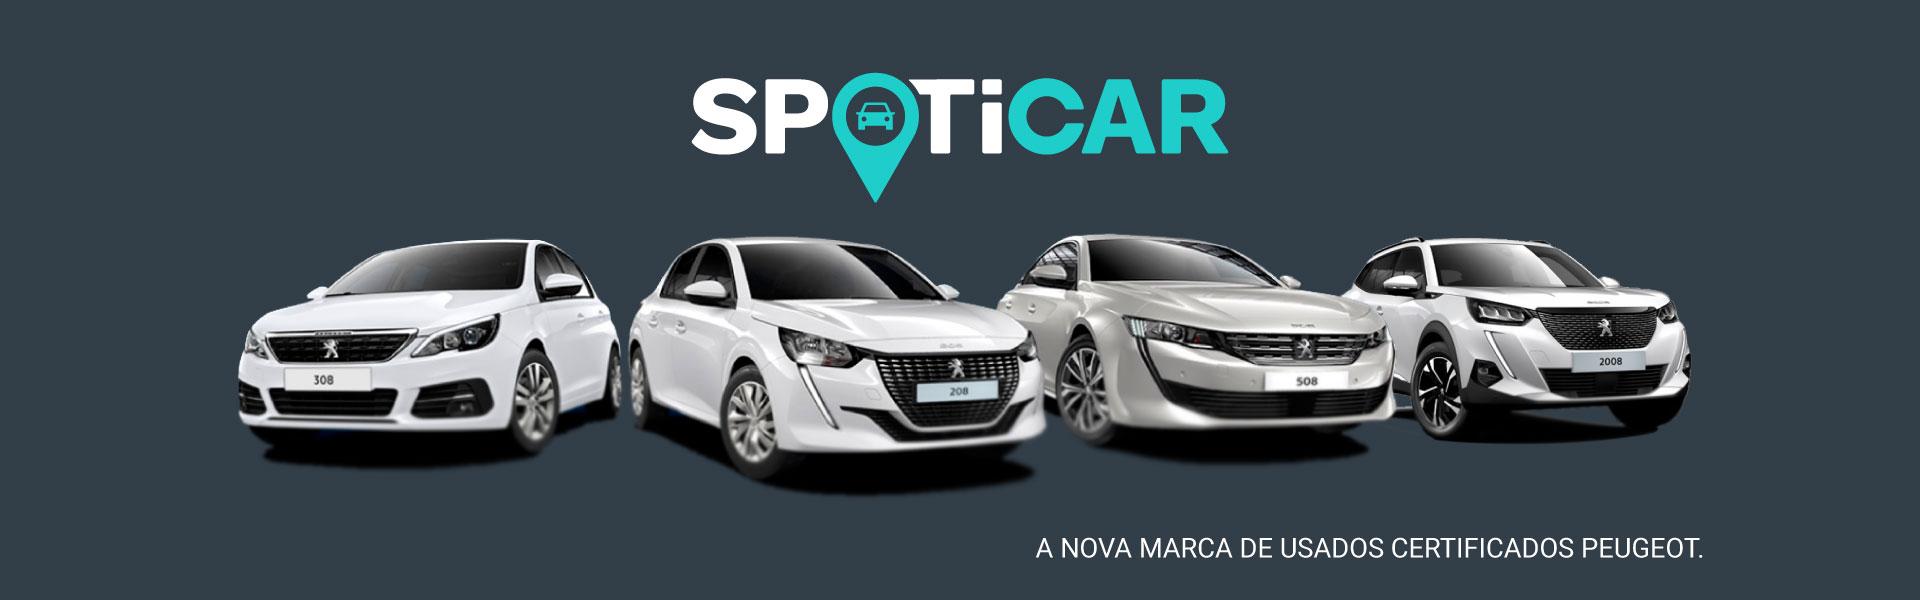 Peugeot Spoticar usados